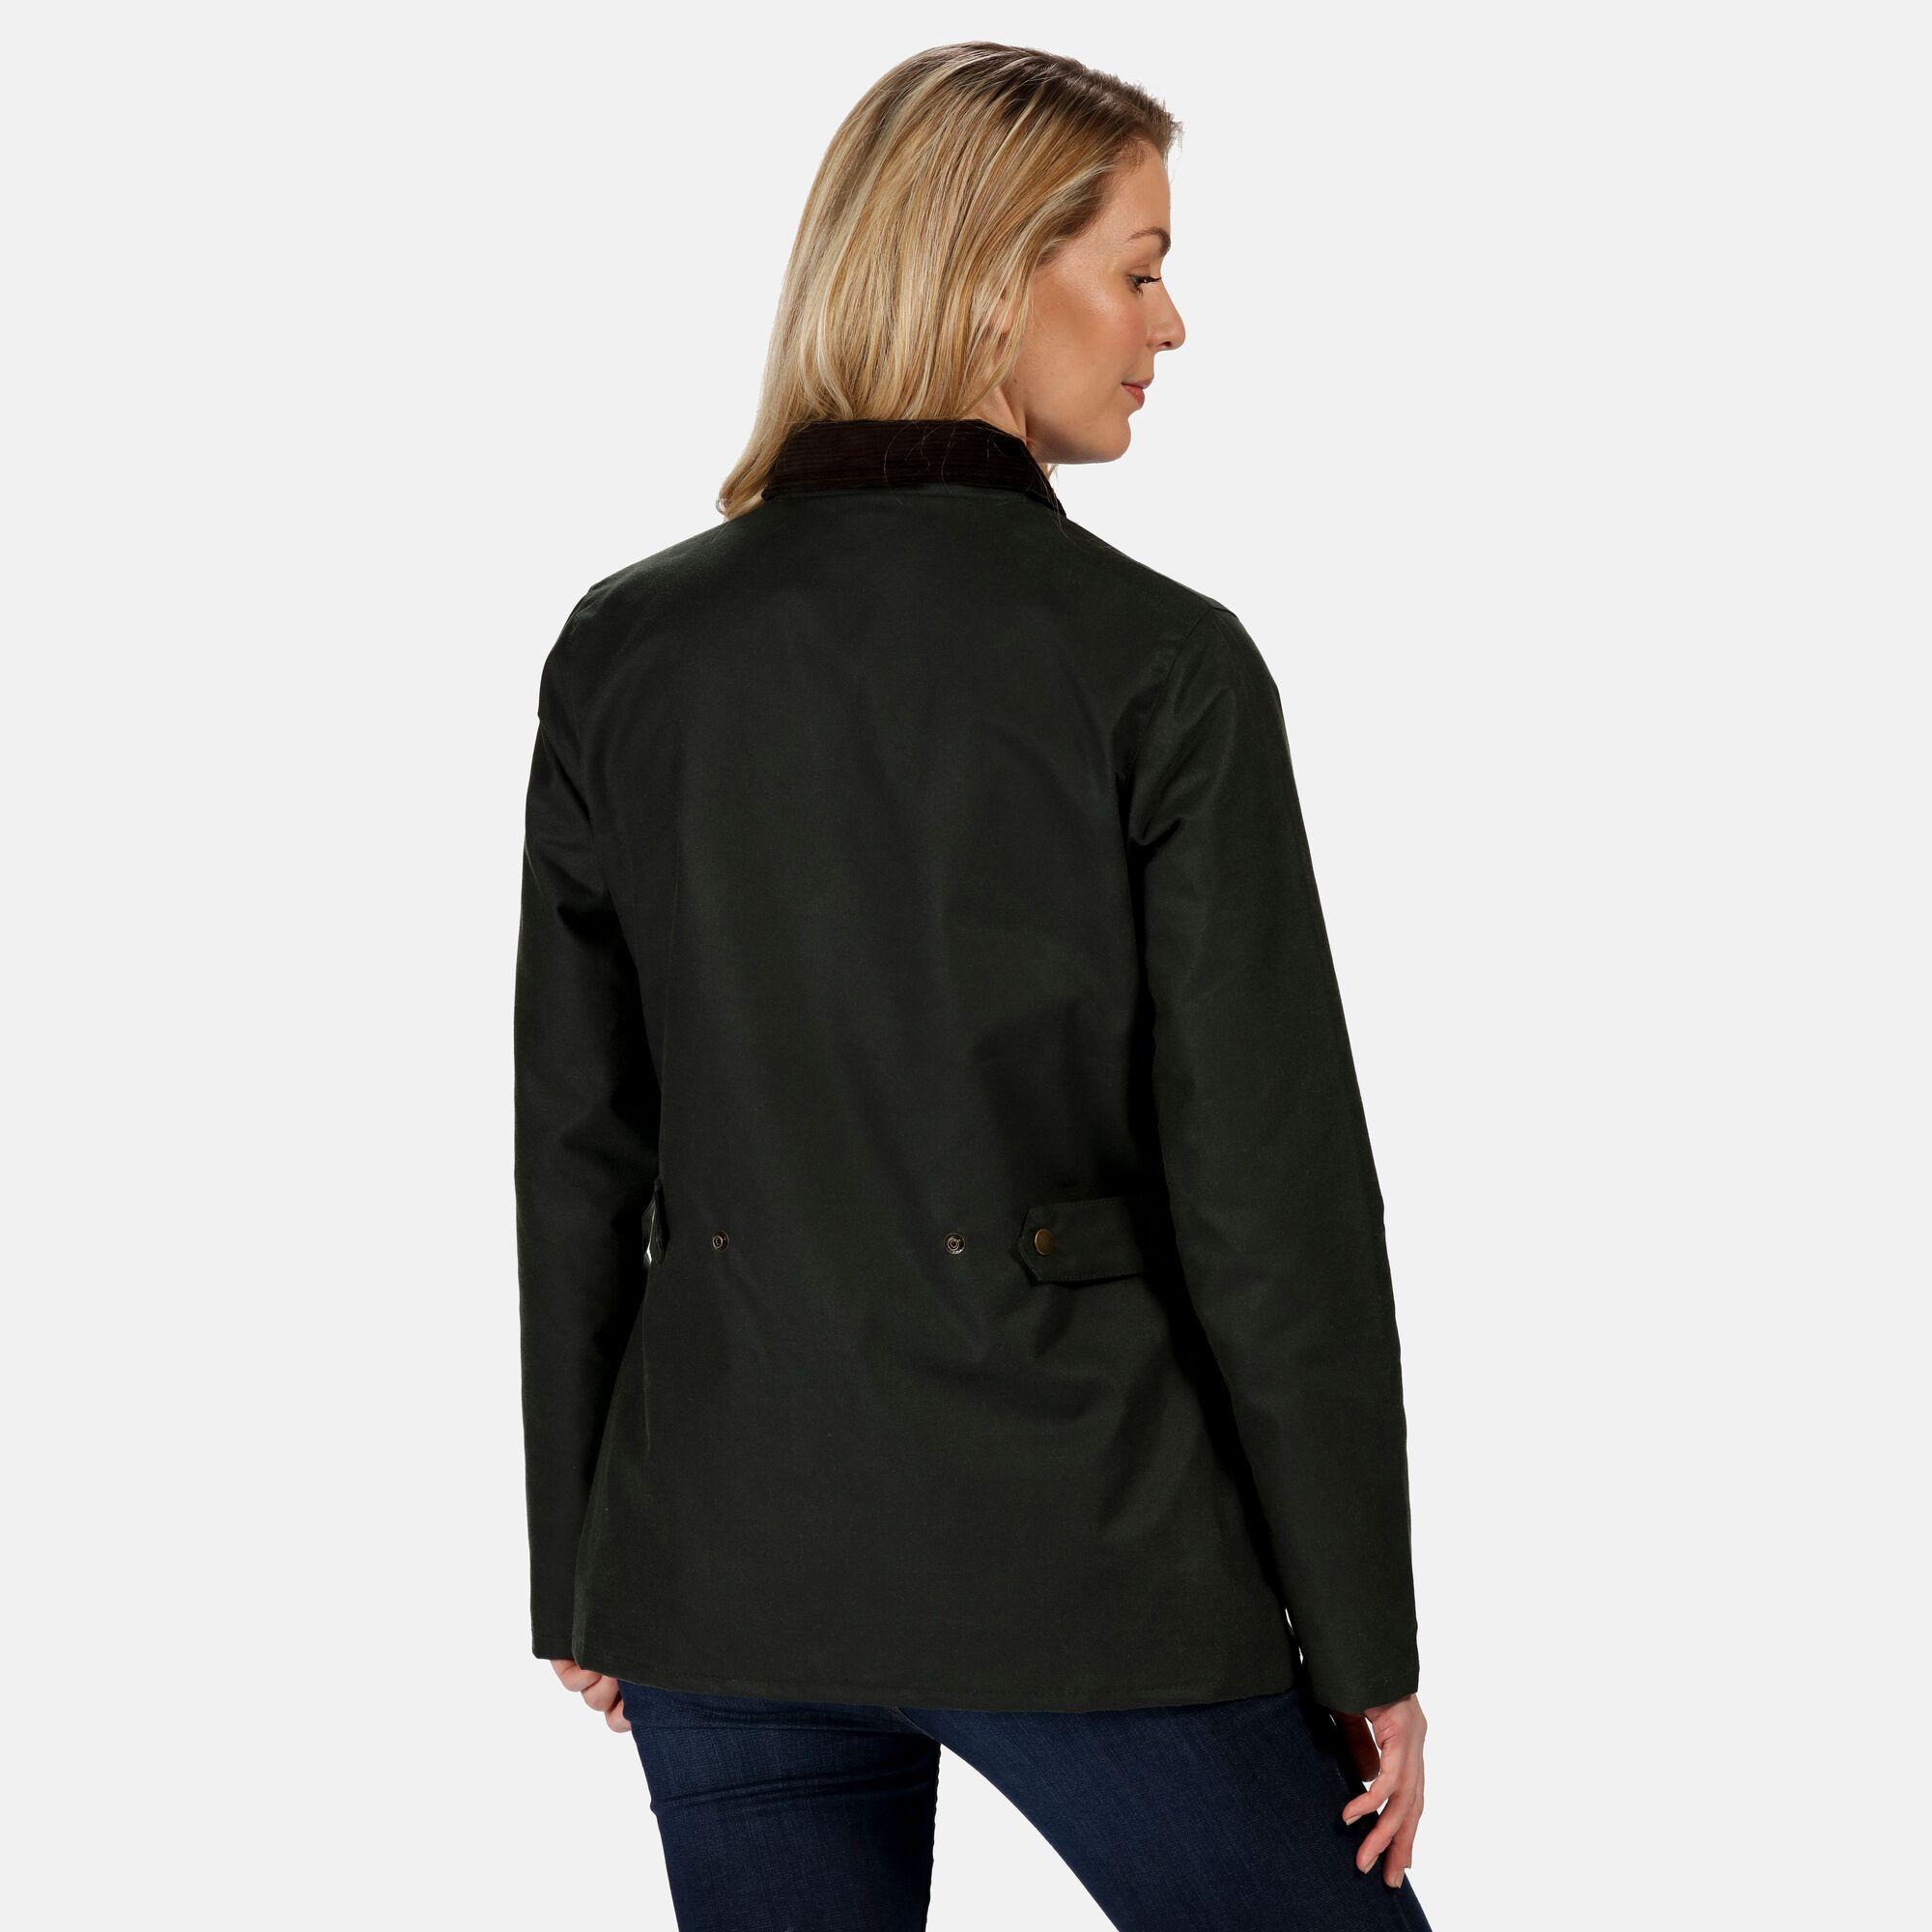 Regatta Womens/Ladies Lady Country Waterproof Jacket (Dark Khaki)